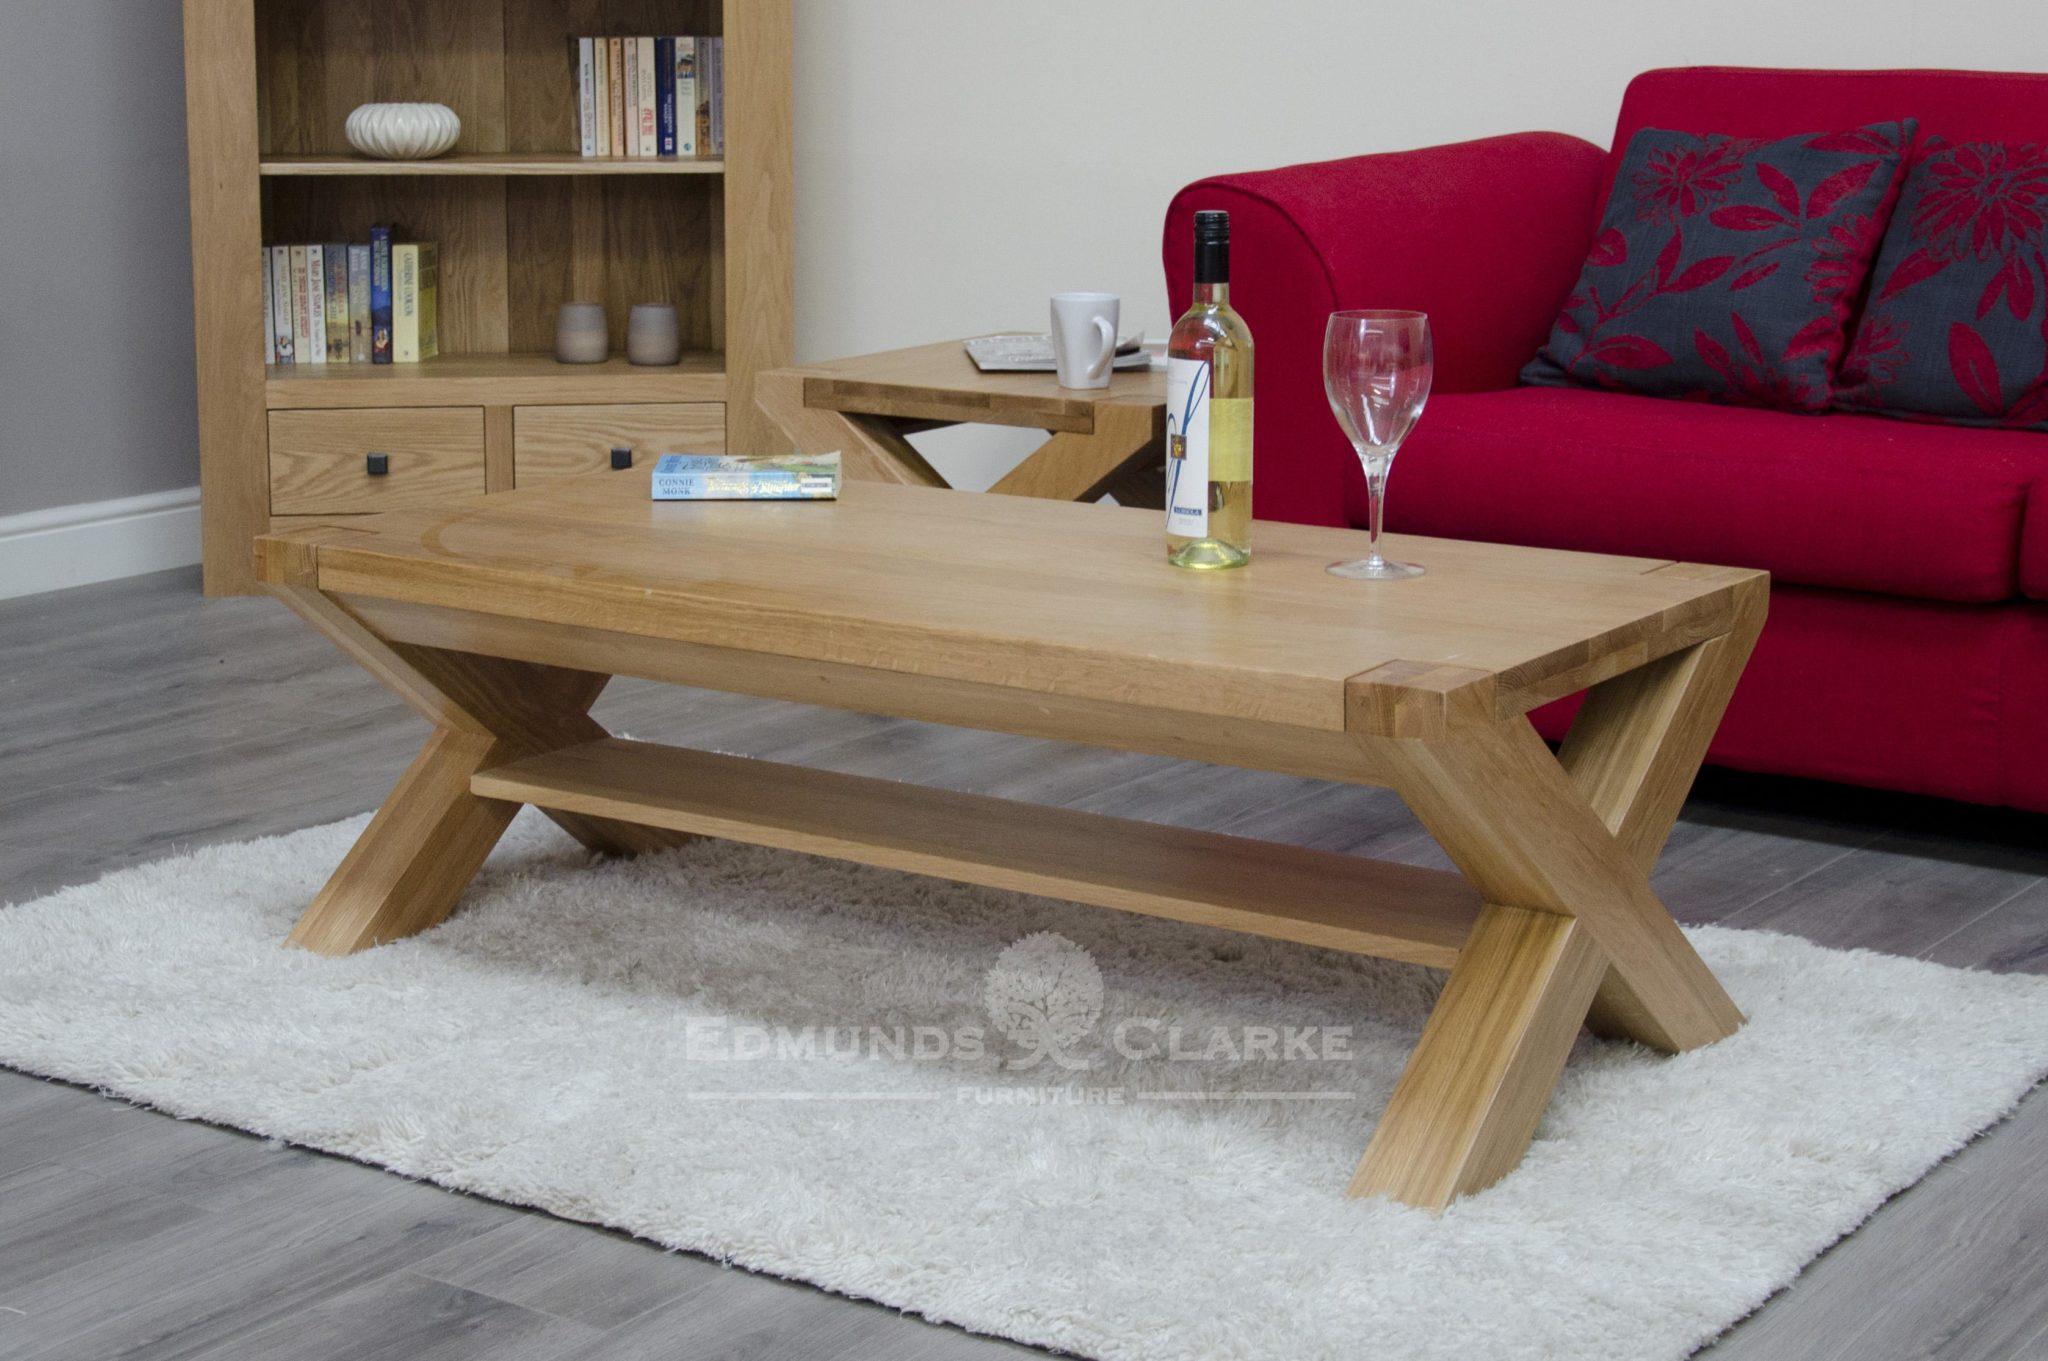 Cross leg coffee table 4' x 2' with small shelf below